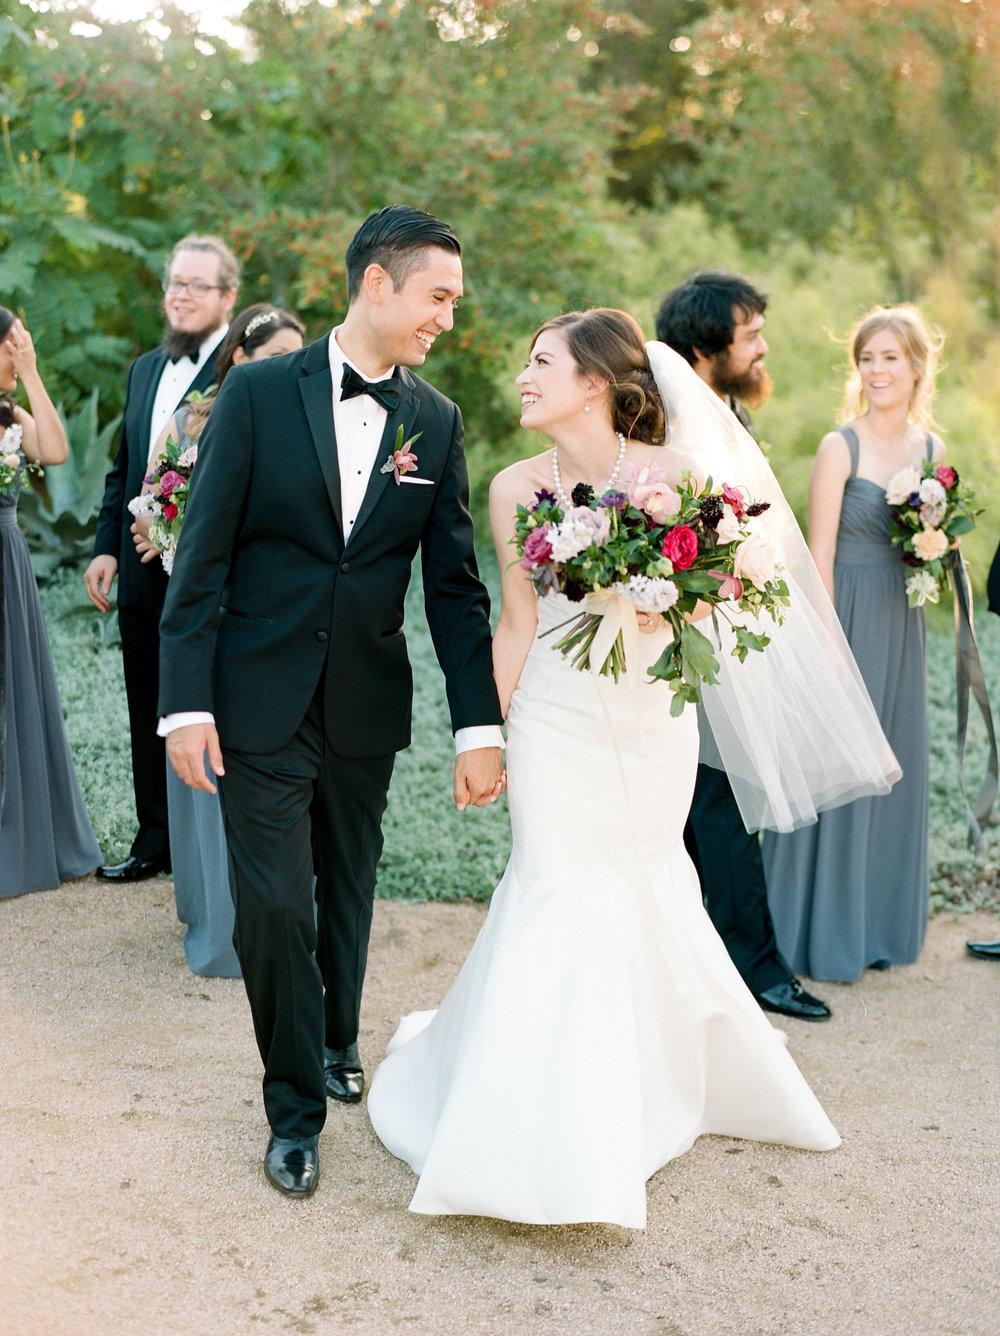 The-Knot-Texas-Magazine-Wedding-Top-Best-Houston-Wedding-Photographer-Fine-Art-Film-Dana-Fernandez-Photography-106.jpg